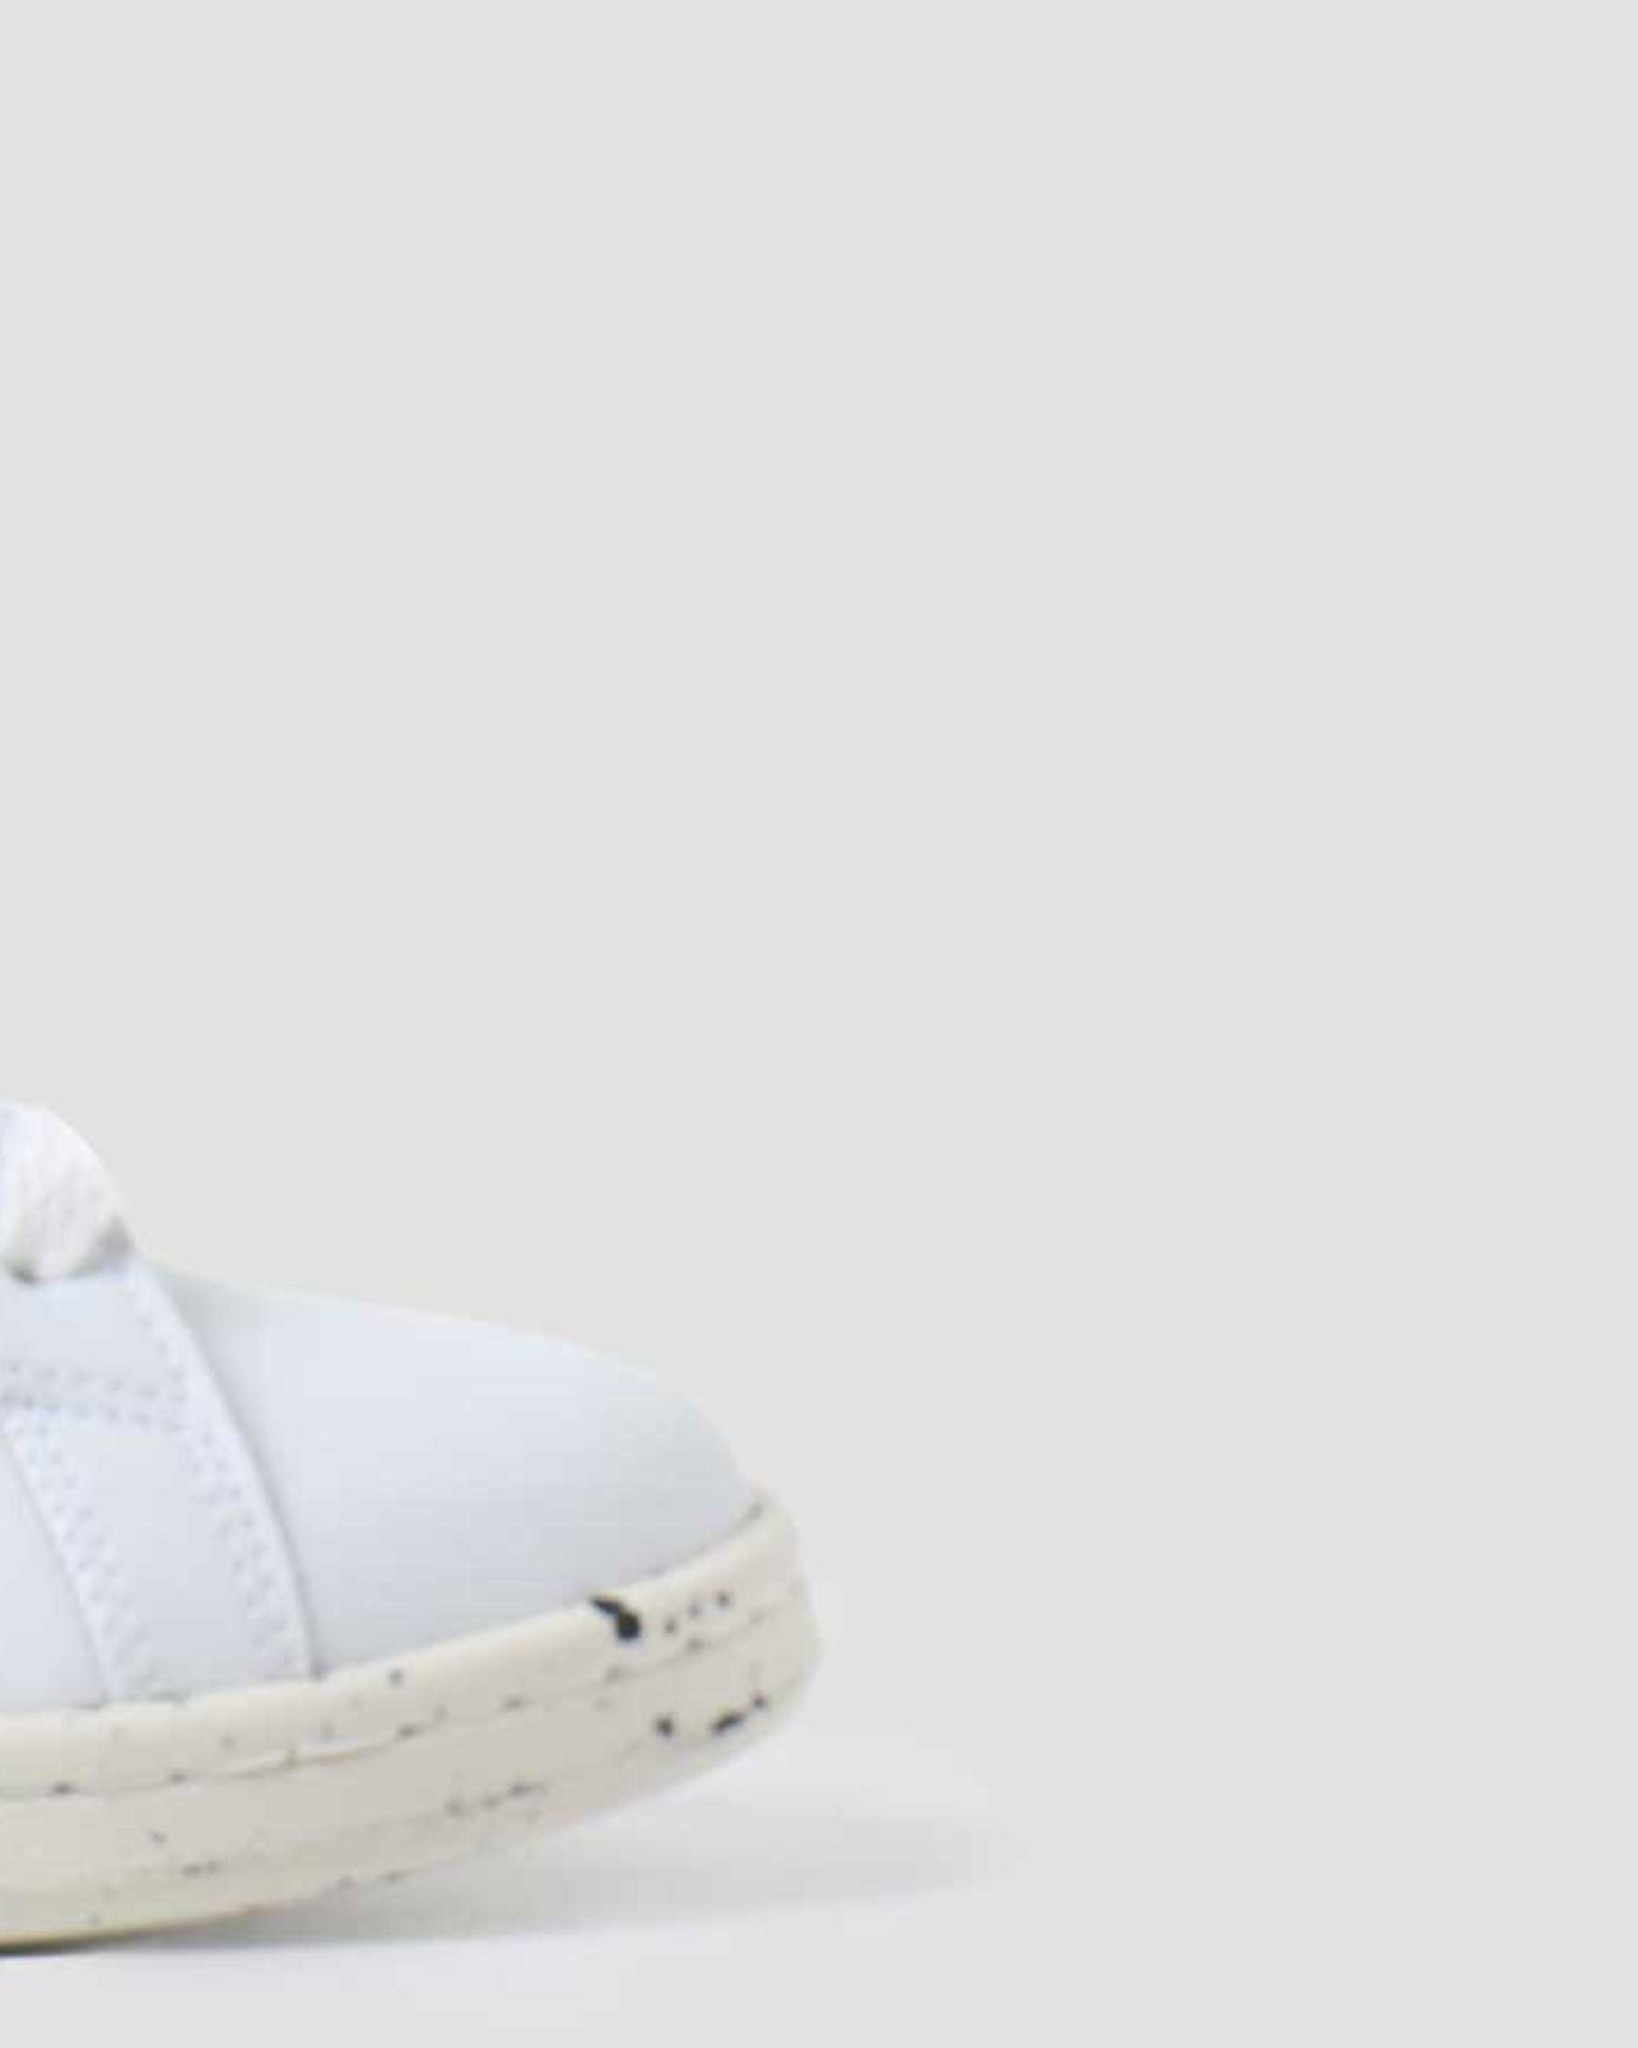 adidas adidas U Stan Smith Footwear White Off-White Green FV0534